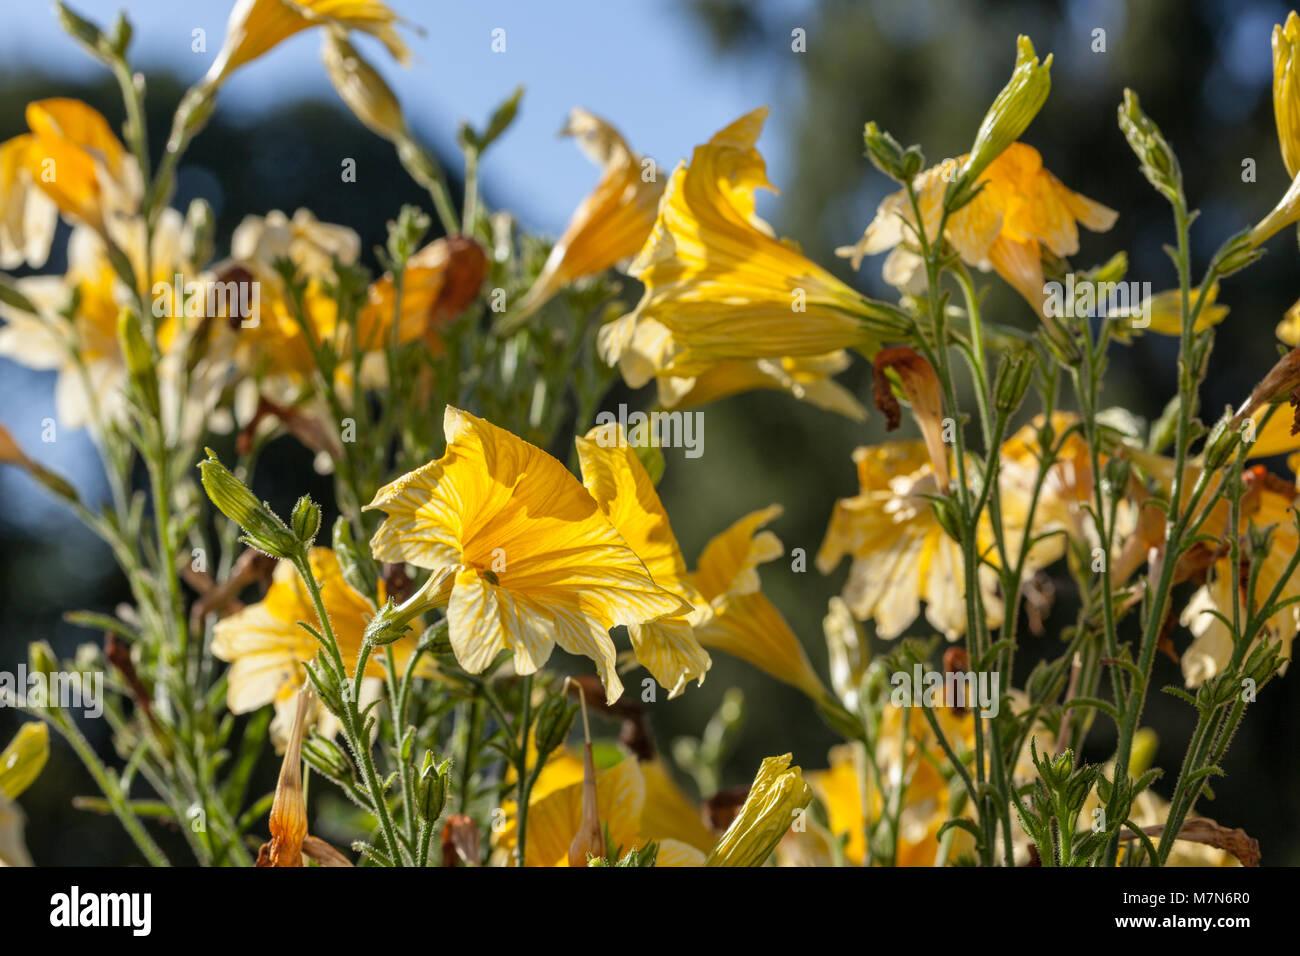 Velvet Trumpet Flower, Trumpetblomma (Salpiglossis sinuata) - Stock Image